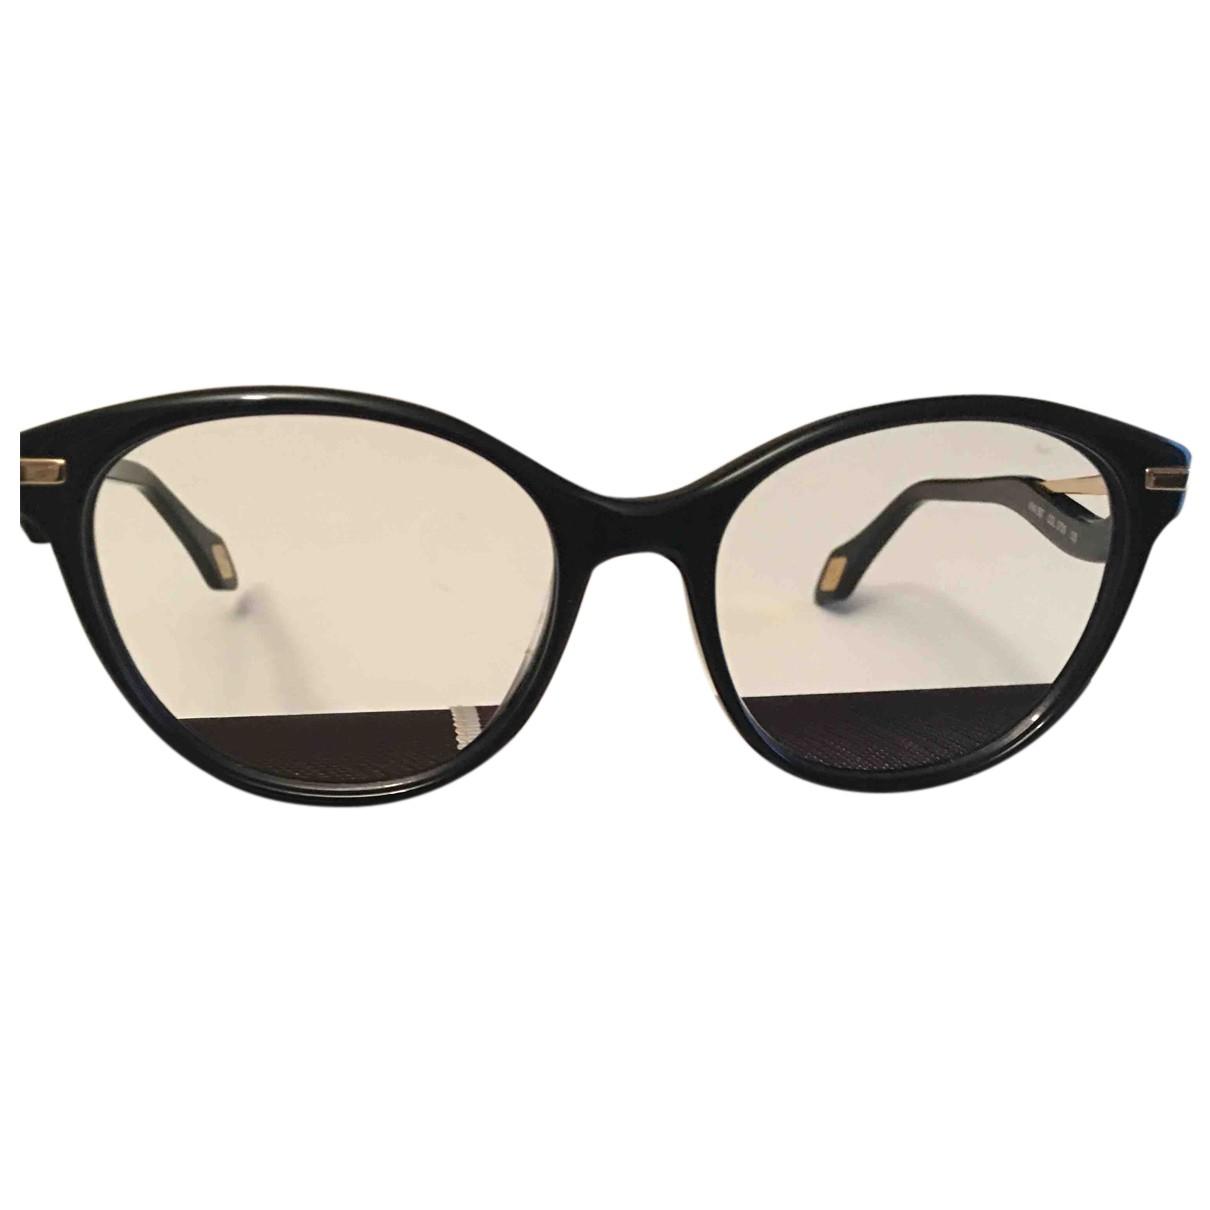 Carolina Herrera N Black Sunglasses for Women N